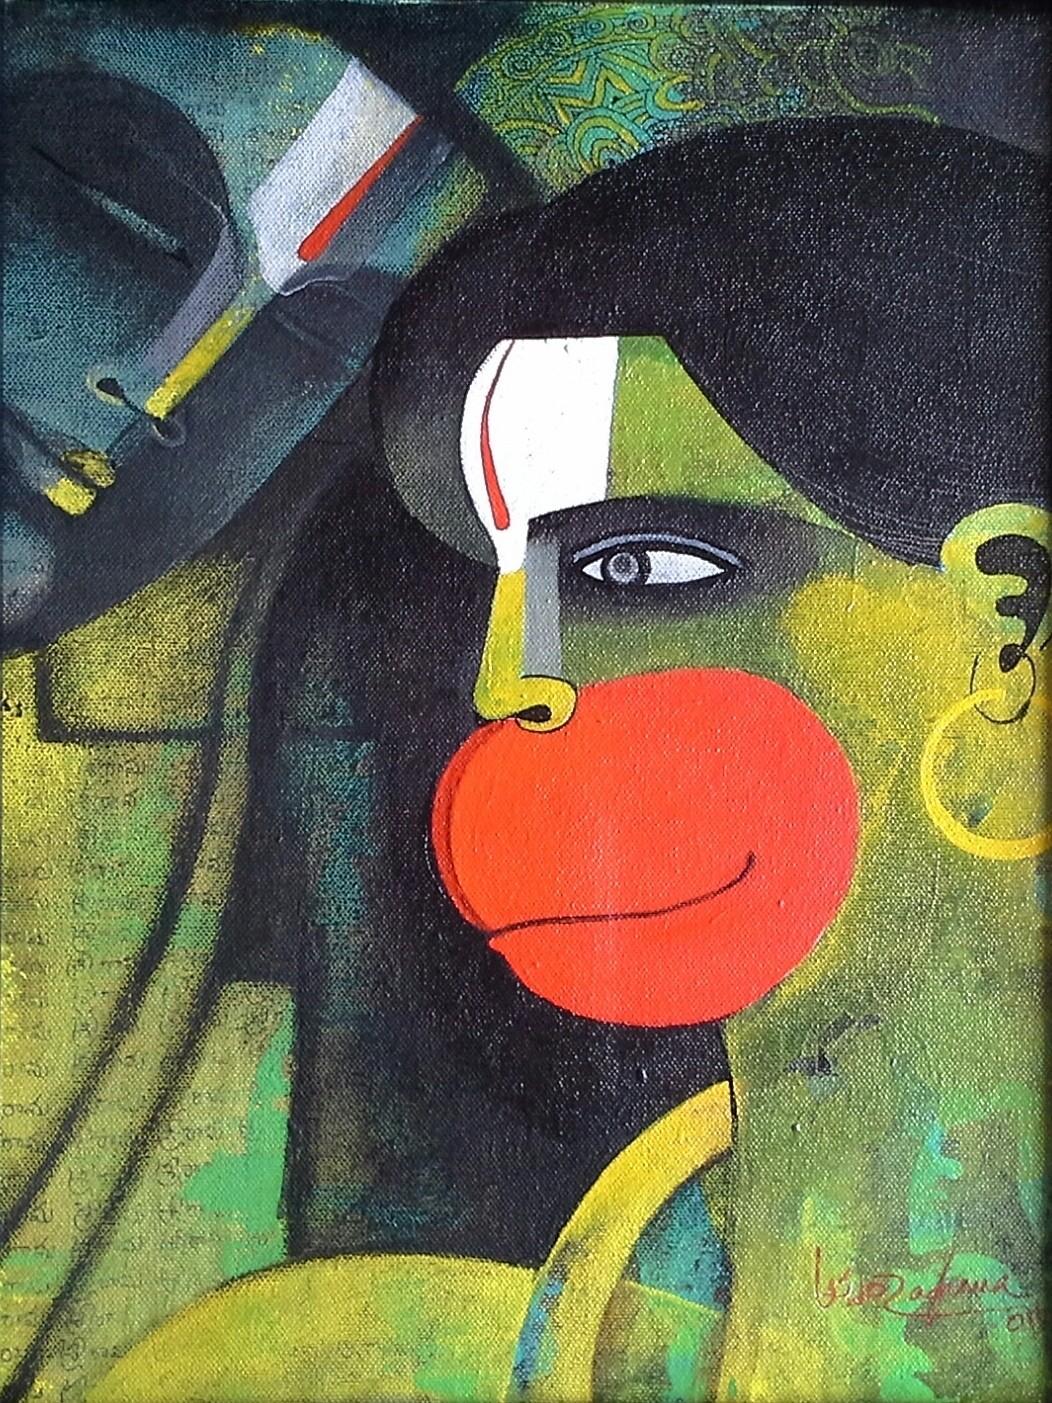 Rama & Hanuman by Appam Raghav, Painting, Acrylic on Canvas, Green color